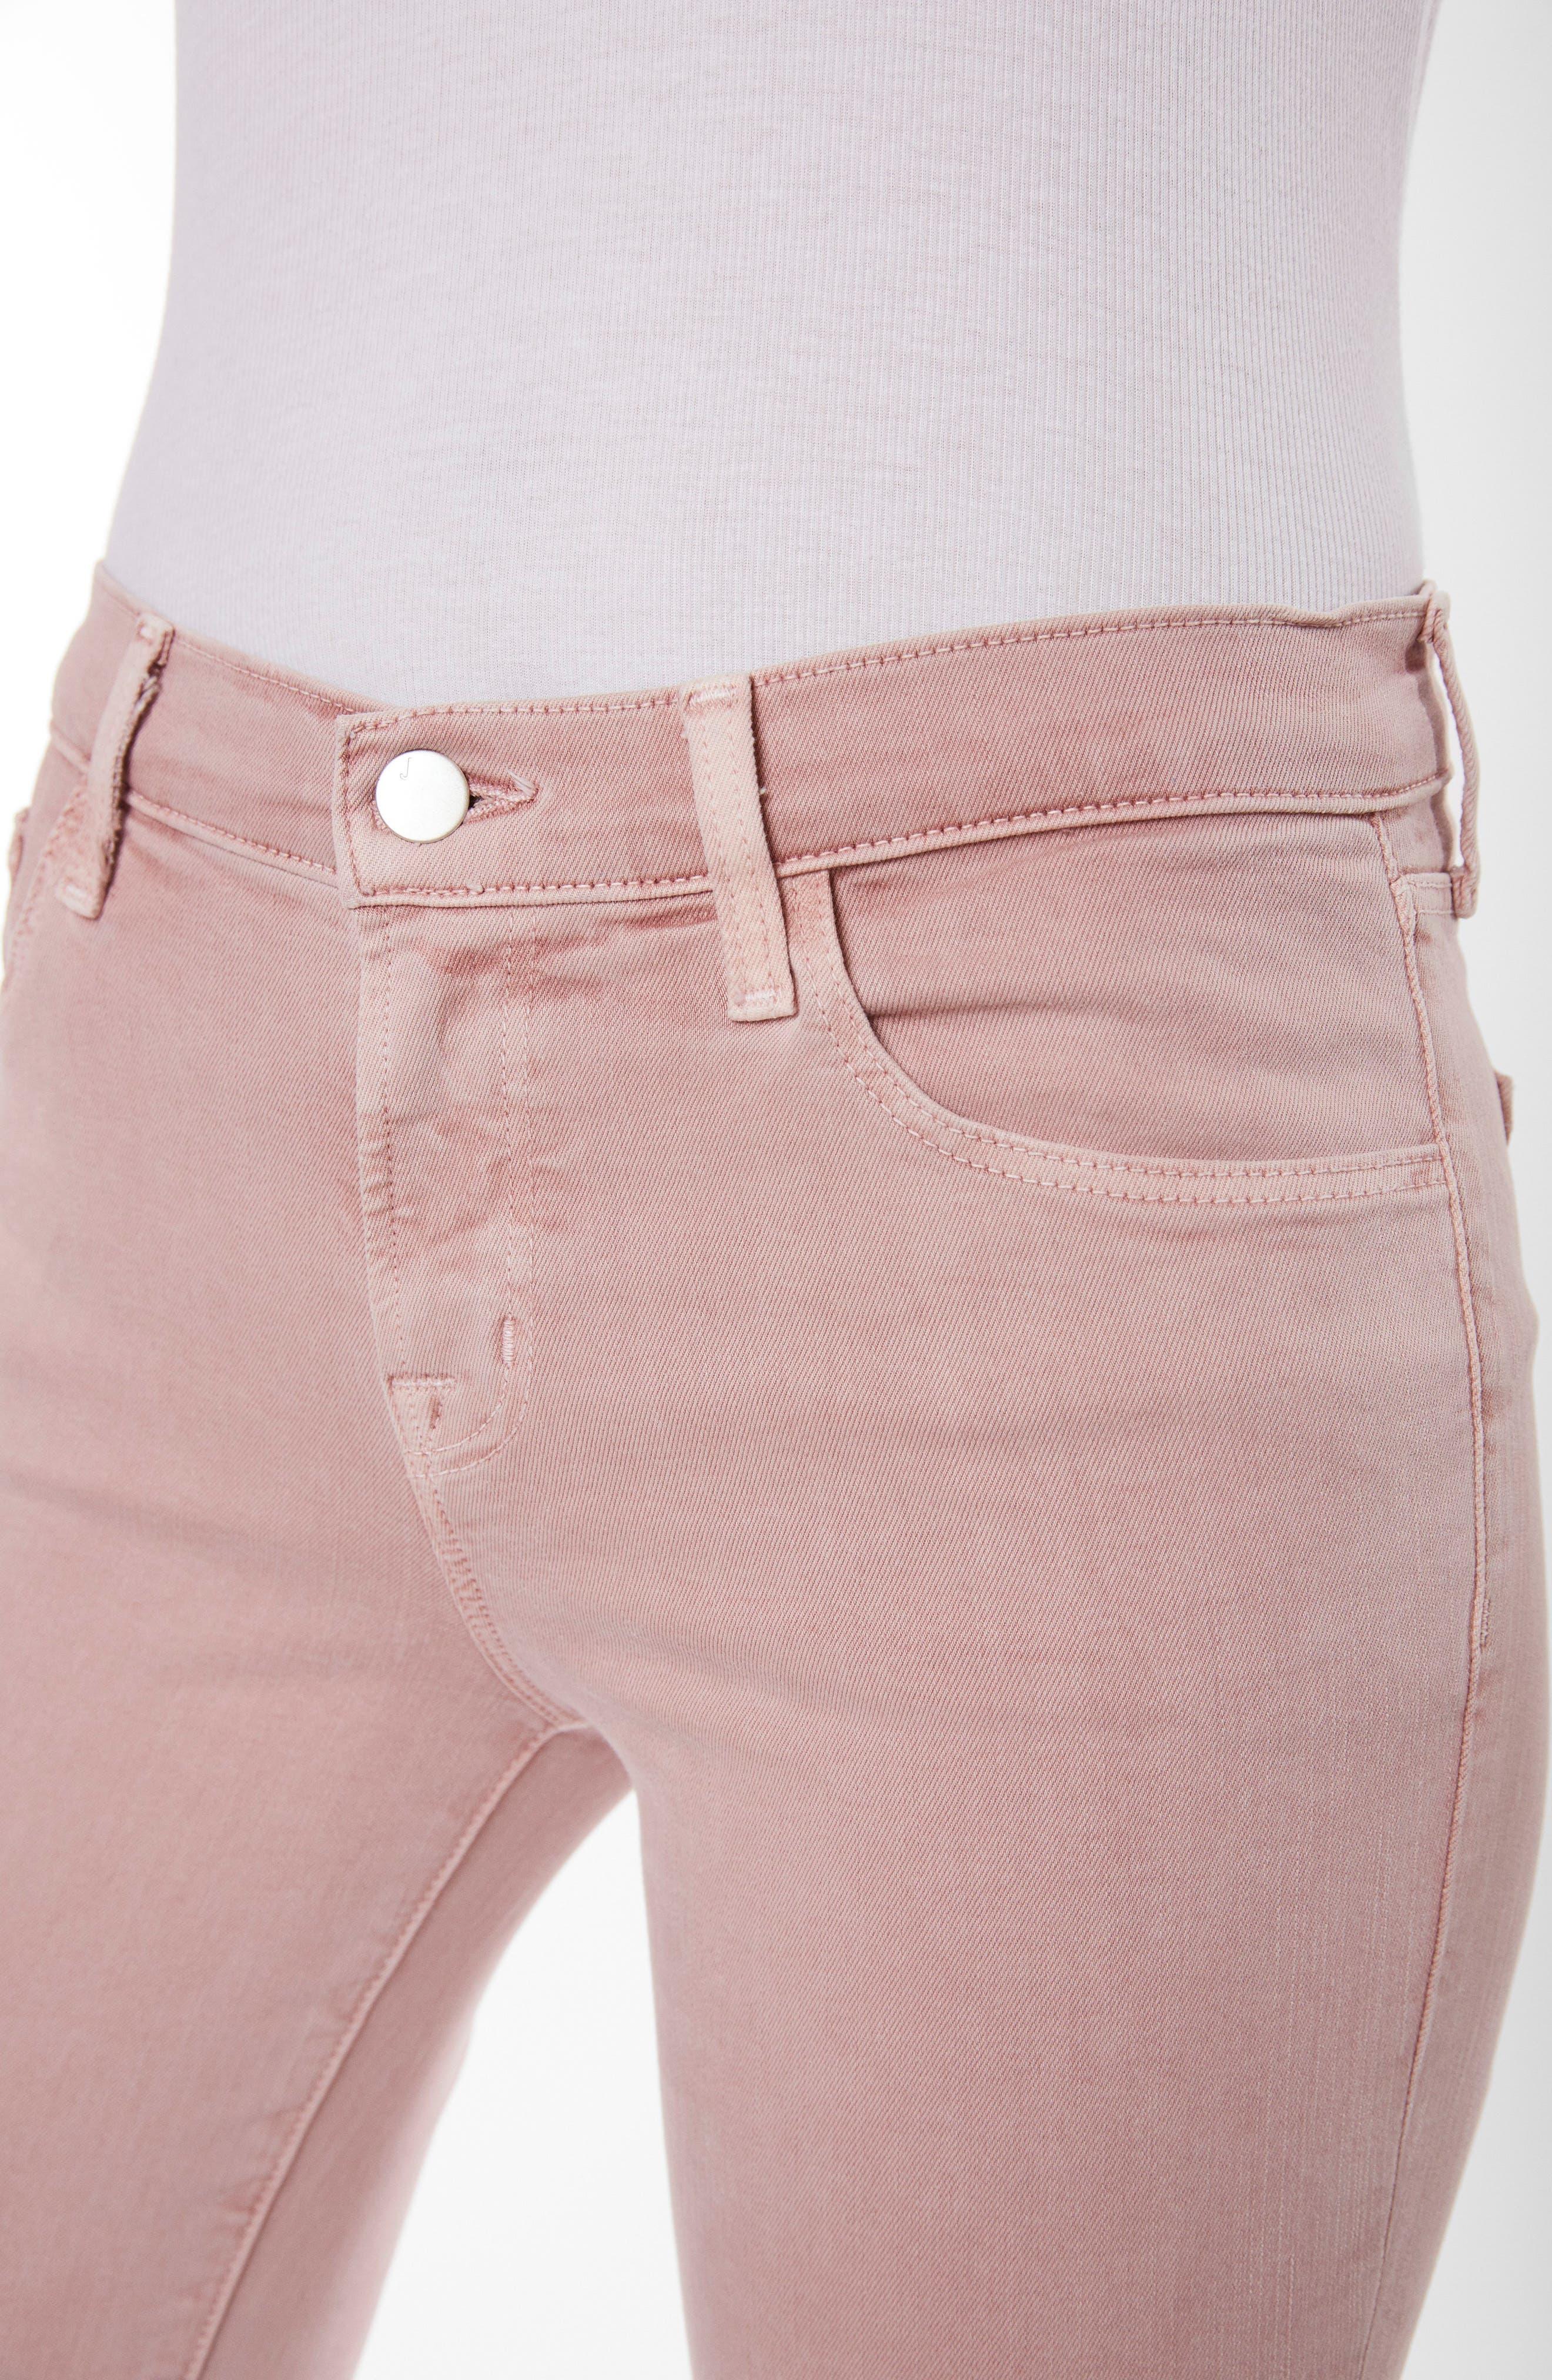 835 Capri Skinny Jeans,                             Alternate thumbnail 4, color,                             Vinca Destruct